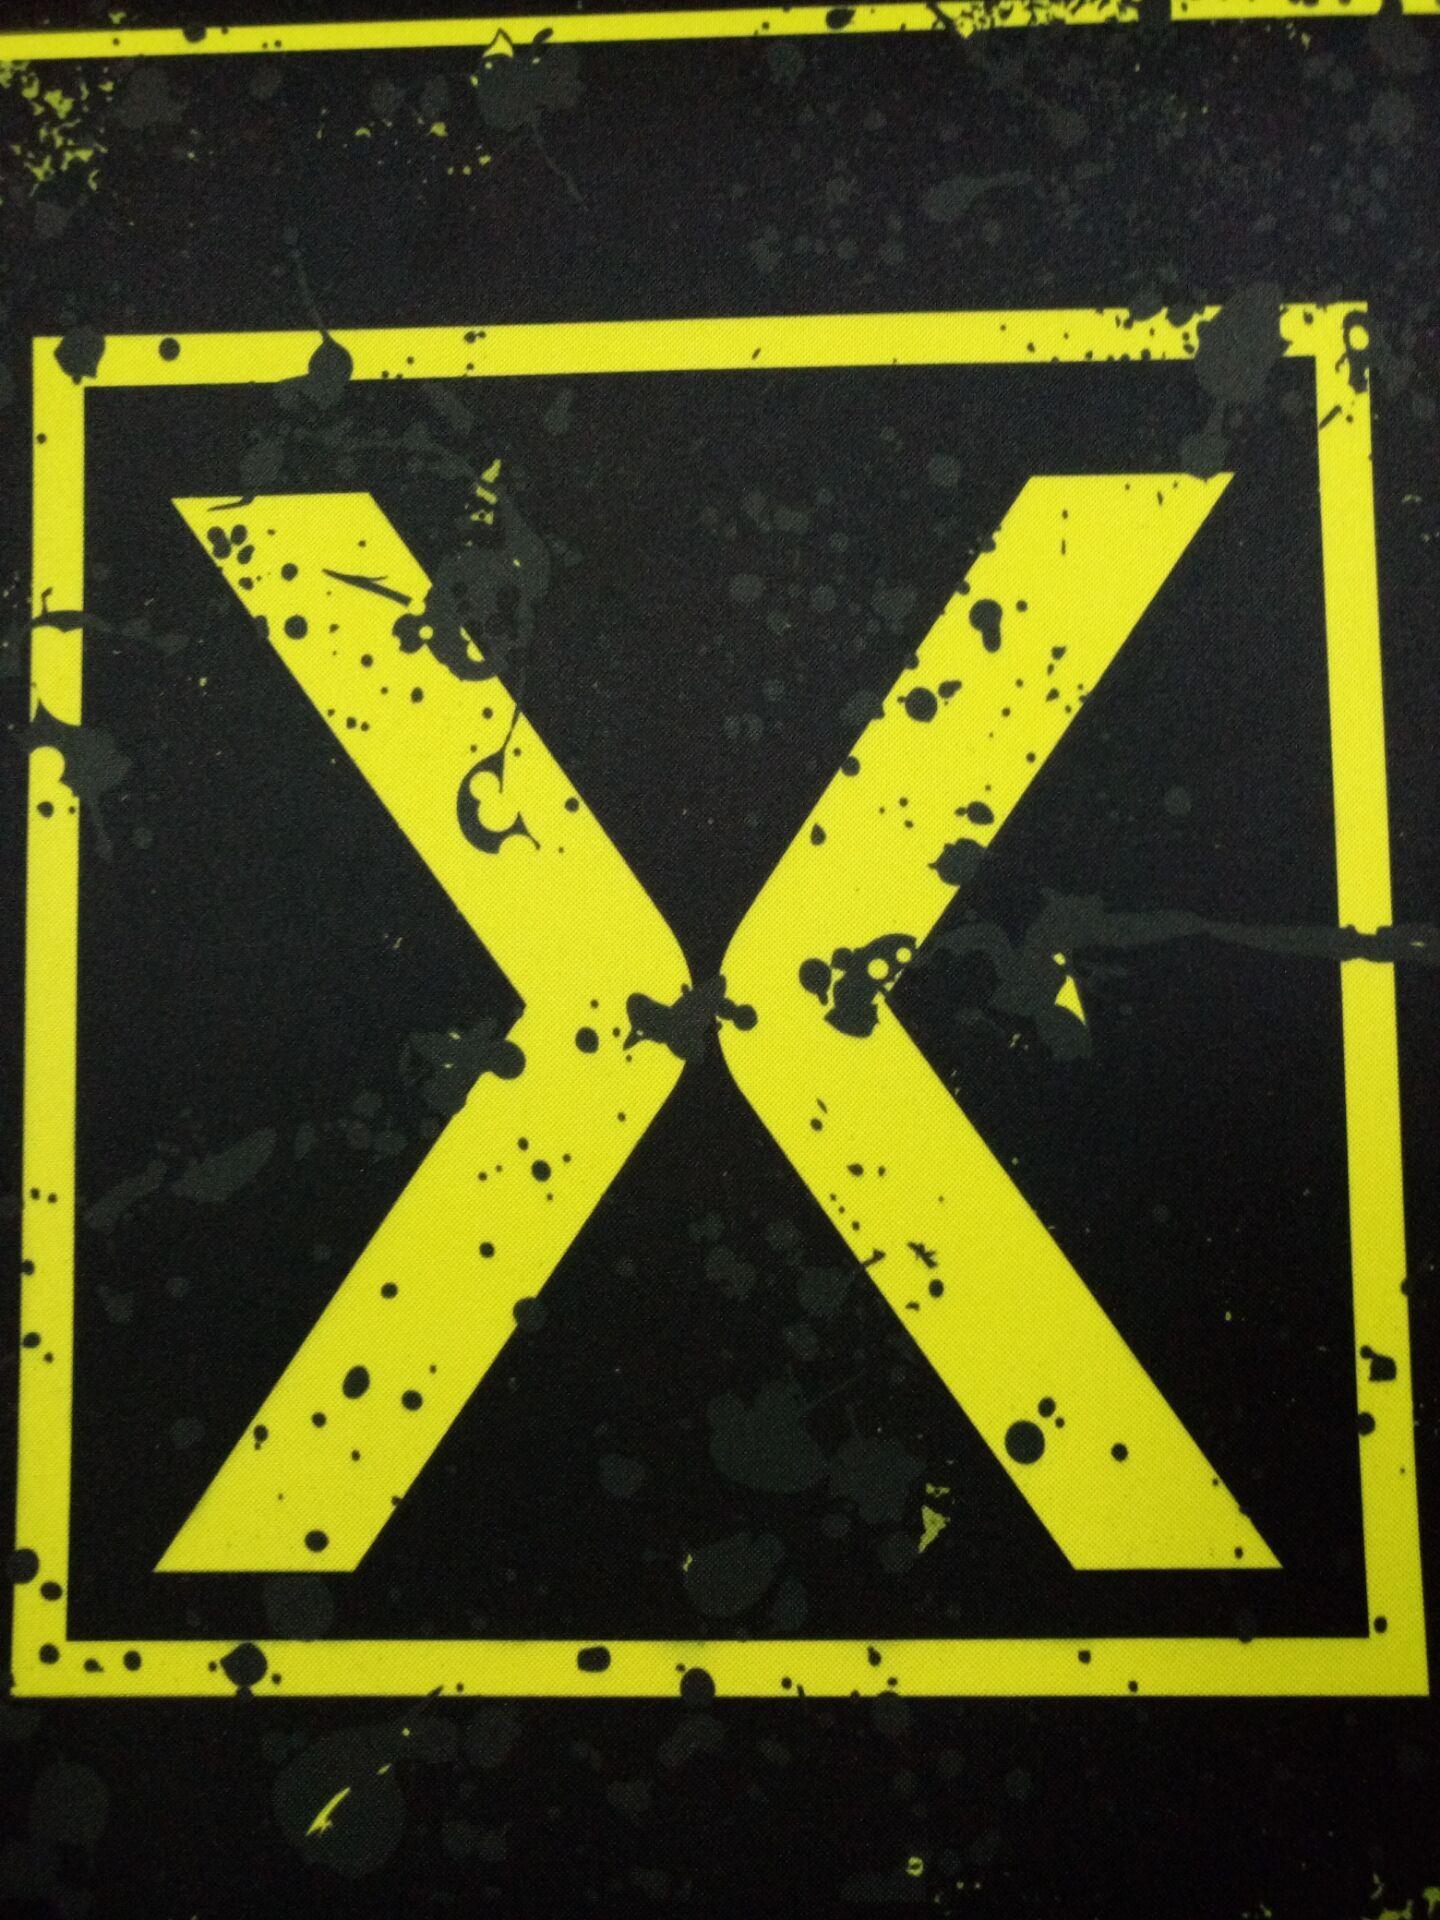 X Flight Drone Positioning landing pads/landing mats